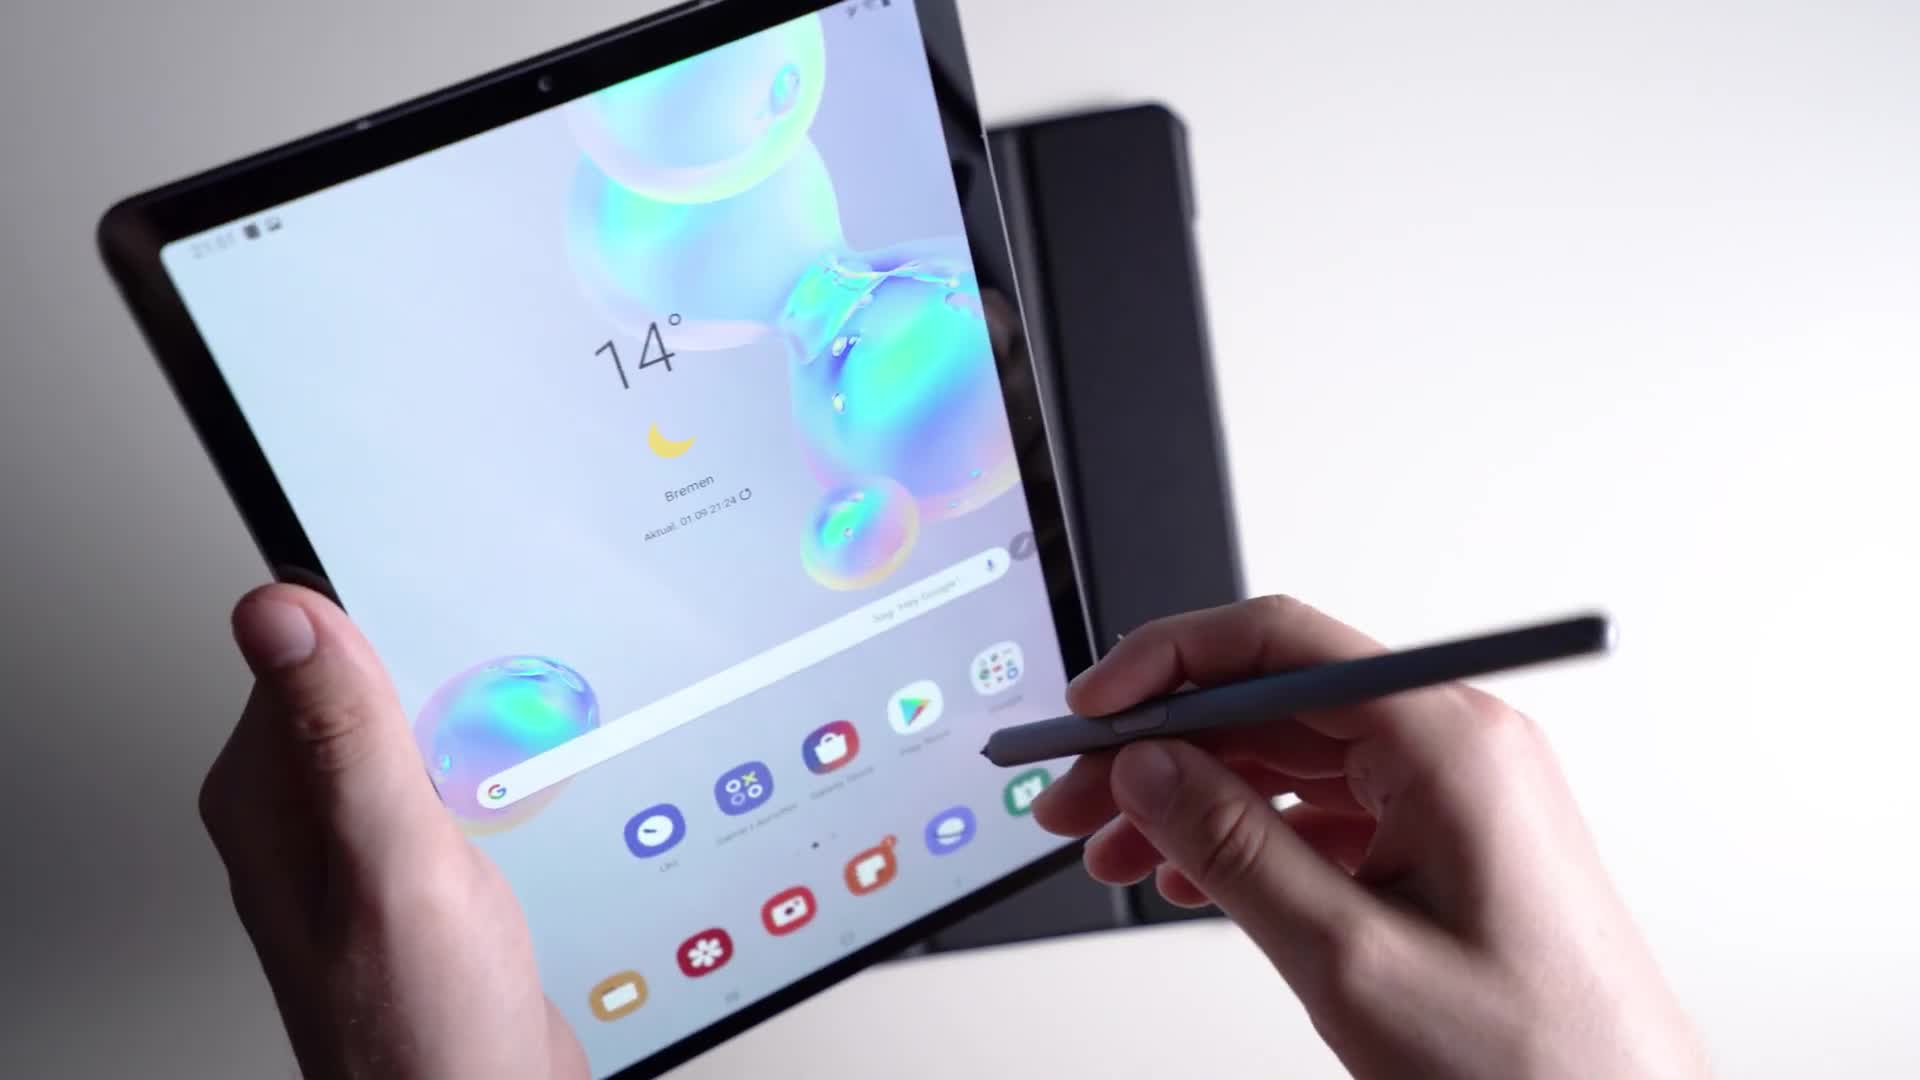 Tablet, Samsung, Galaxy, Samsung Galaxy, Stylus, Andrzej Tokarski, Tabletblog, Samsung Mobile, Stift, S Pen, Tipps und Tricks, Tipps, Samsung Galaxy Tab S6, Galaxy Tab S6